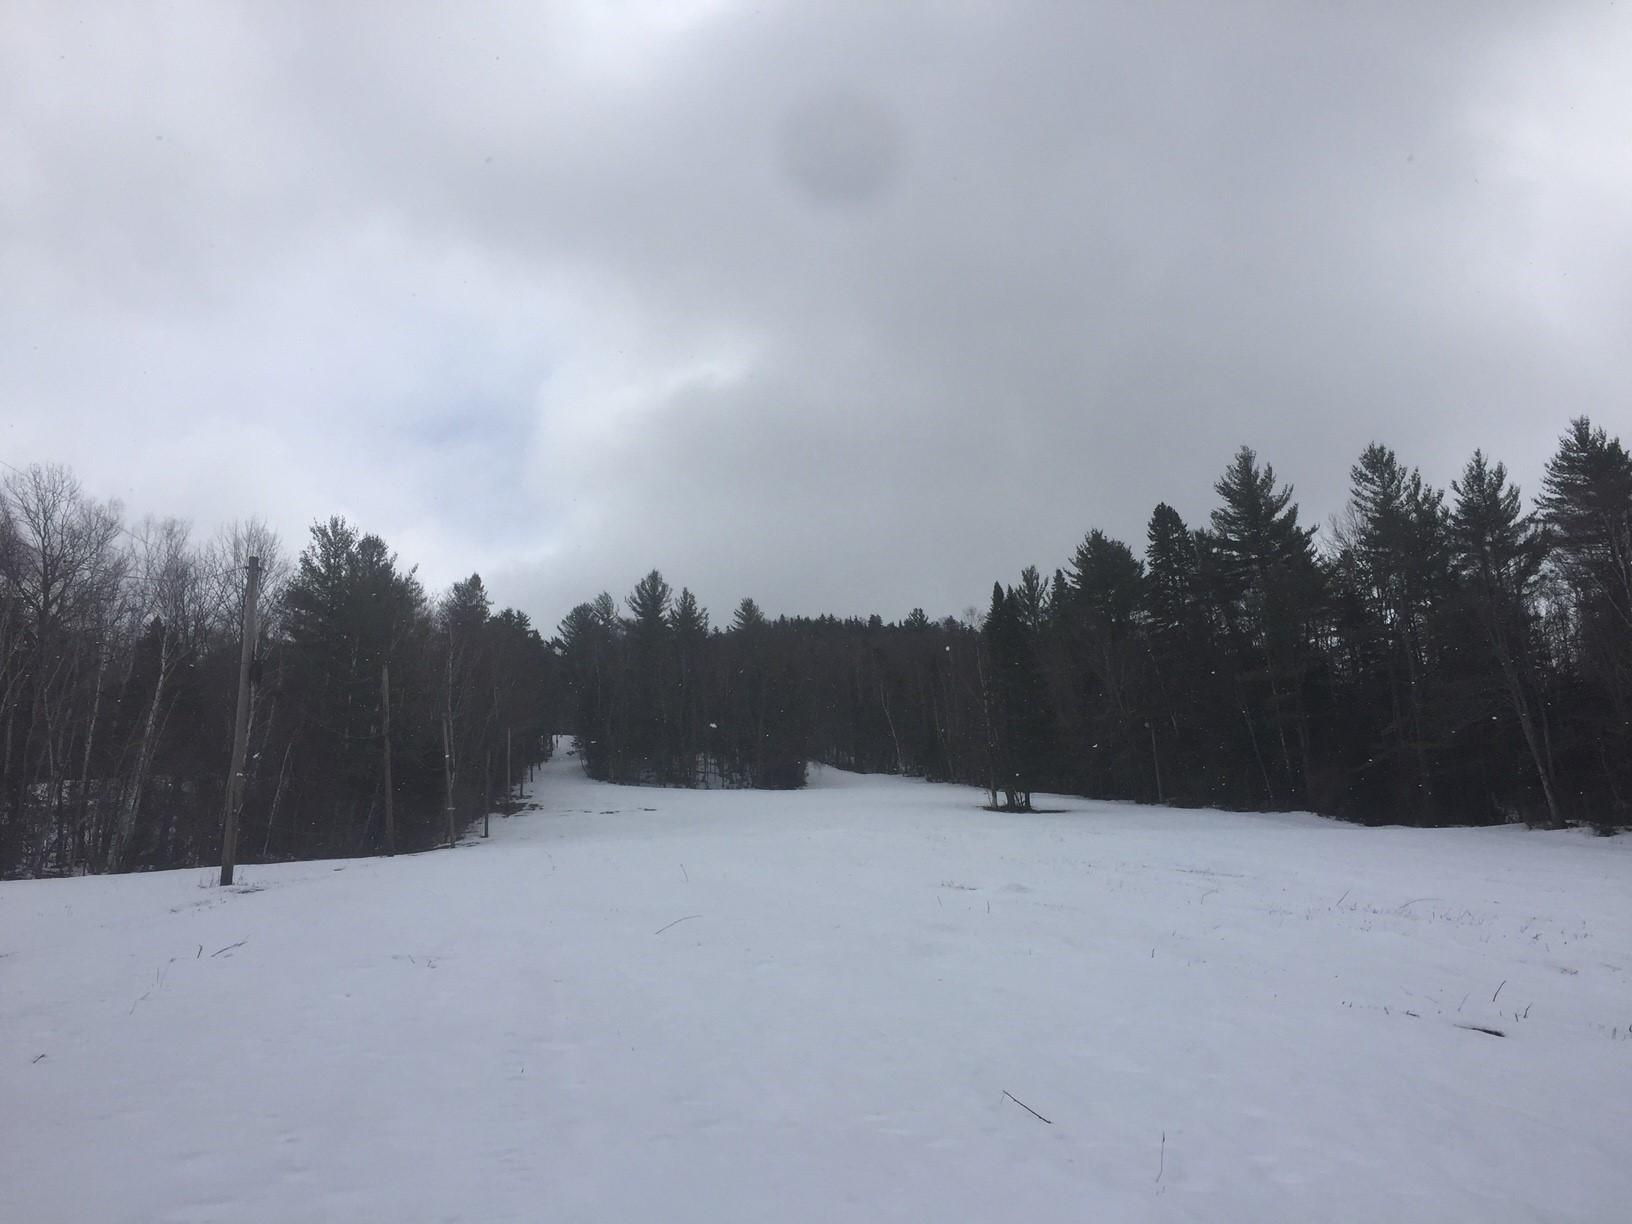 ski tow 3.jpg